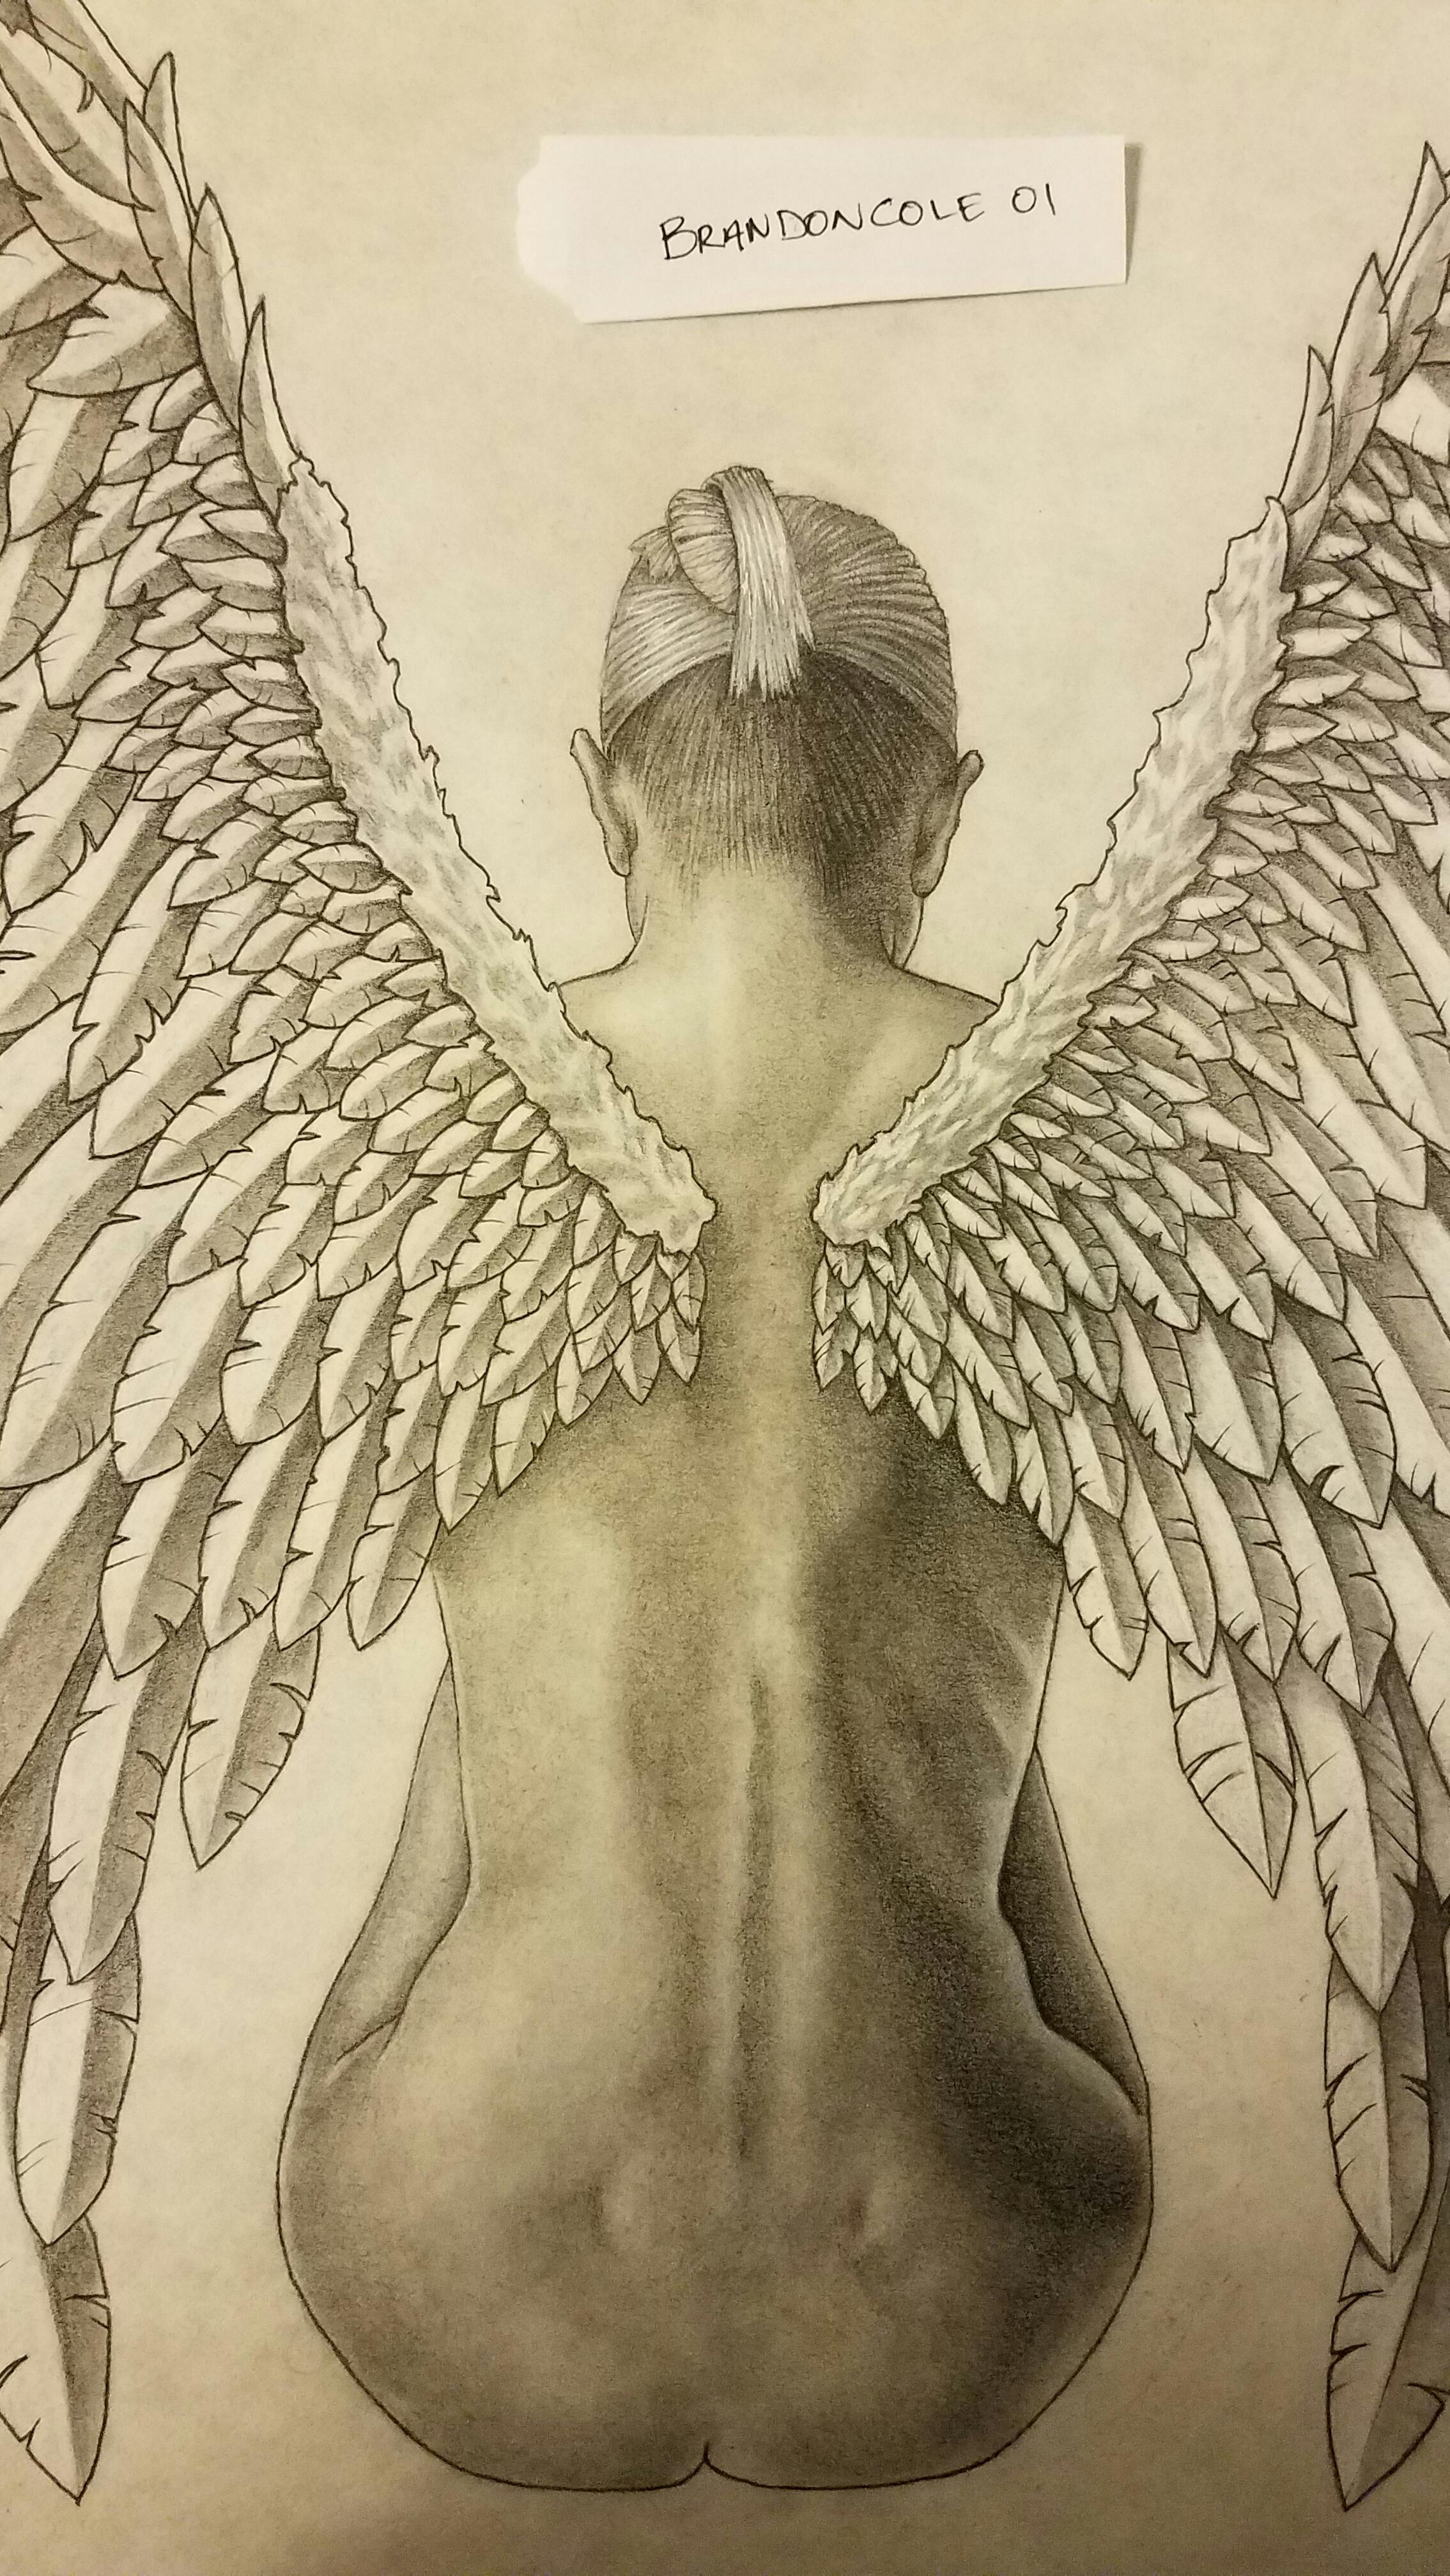 Angel By Brandoncole01 On Newgrounds